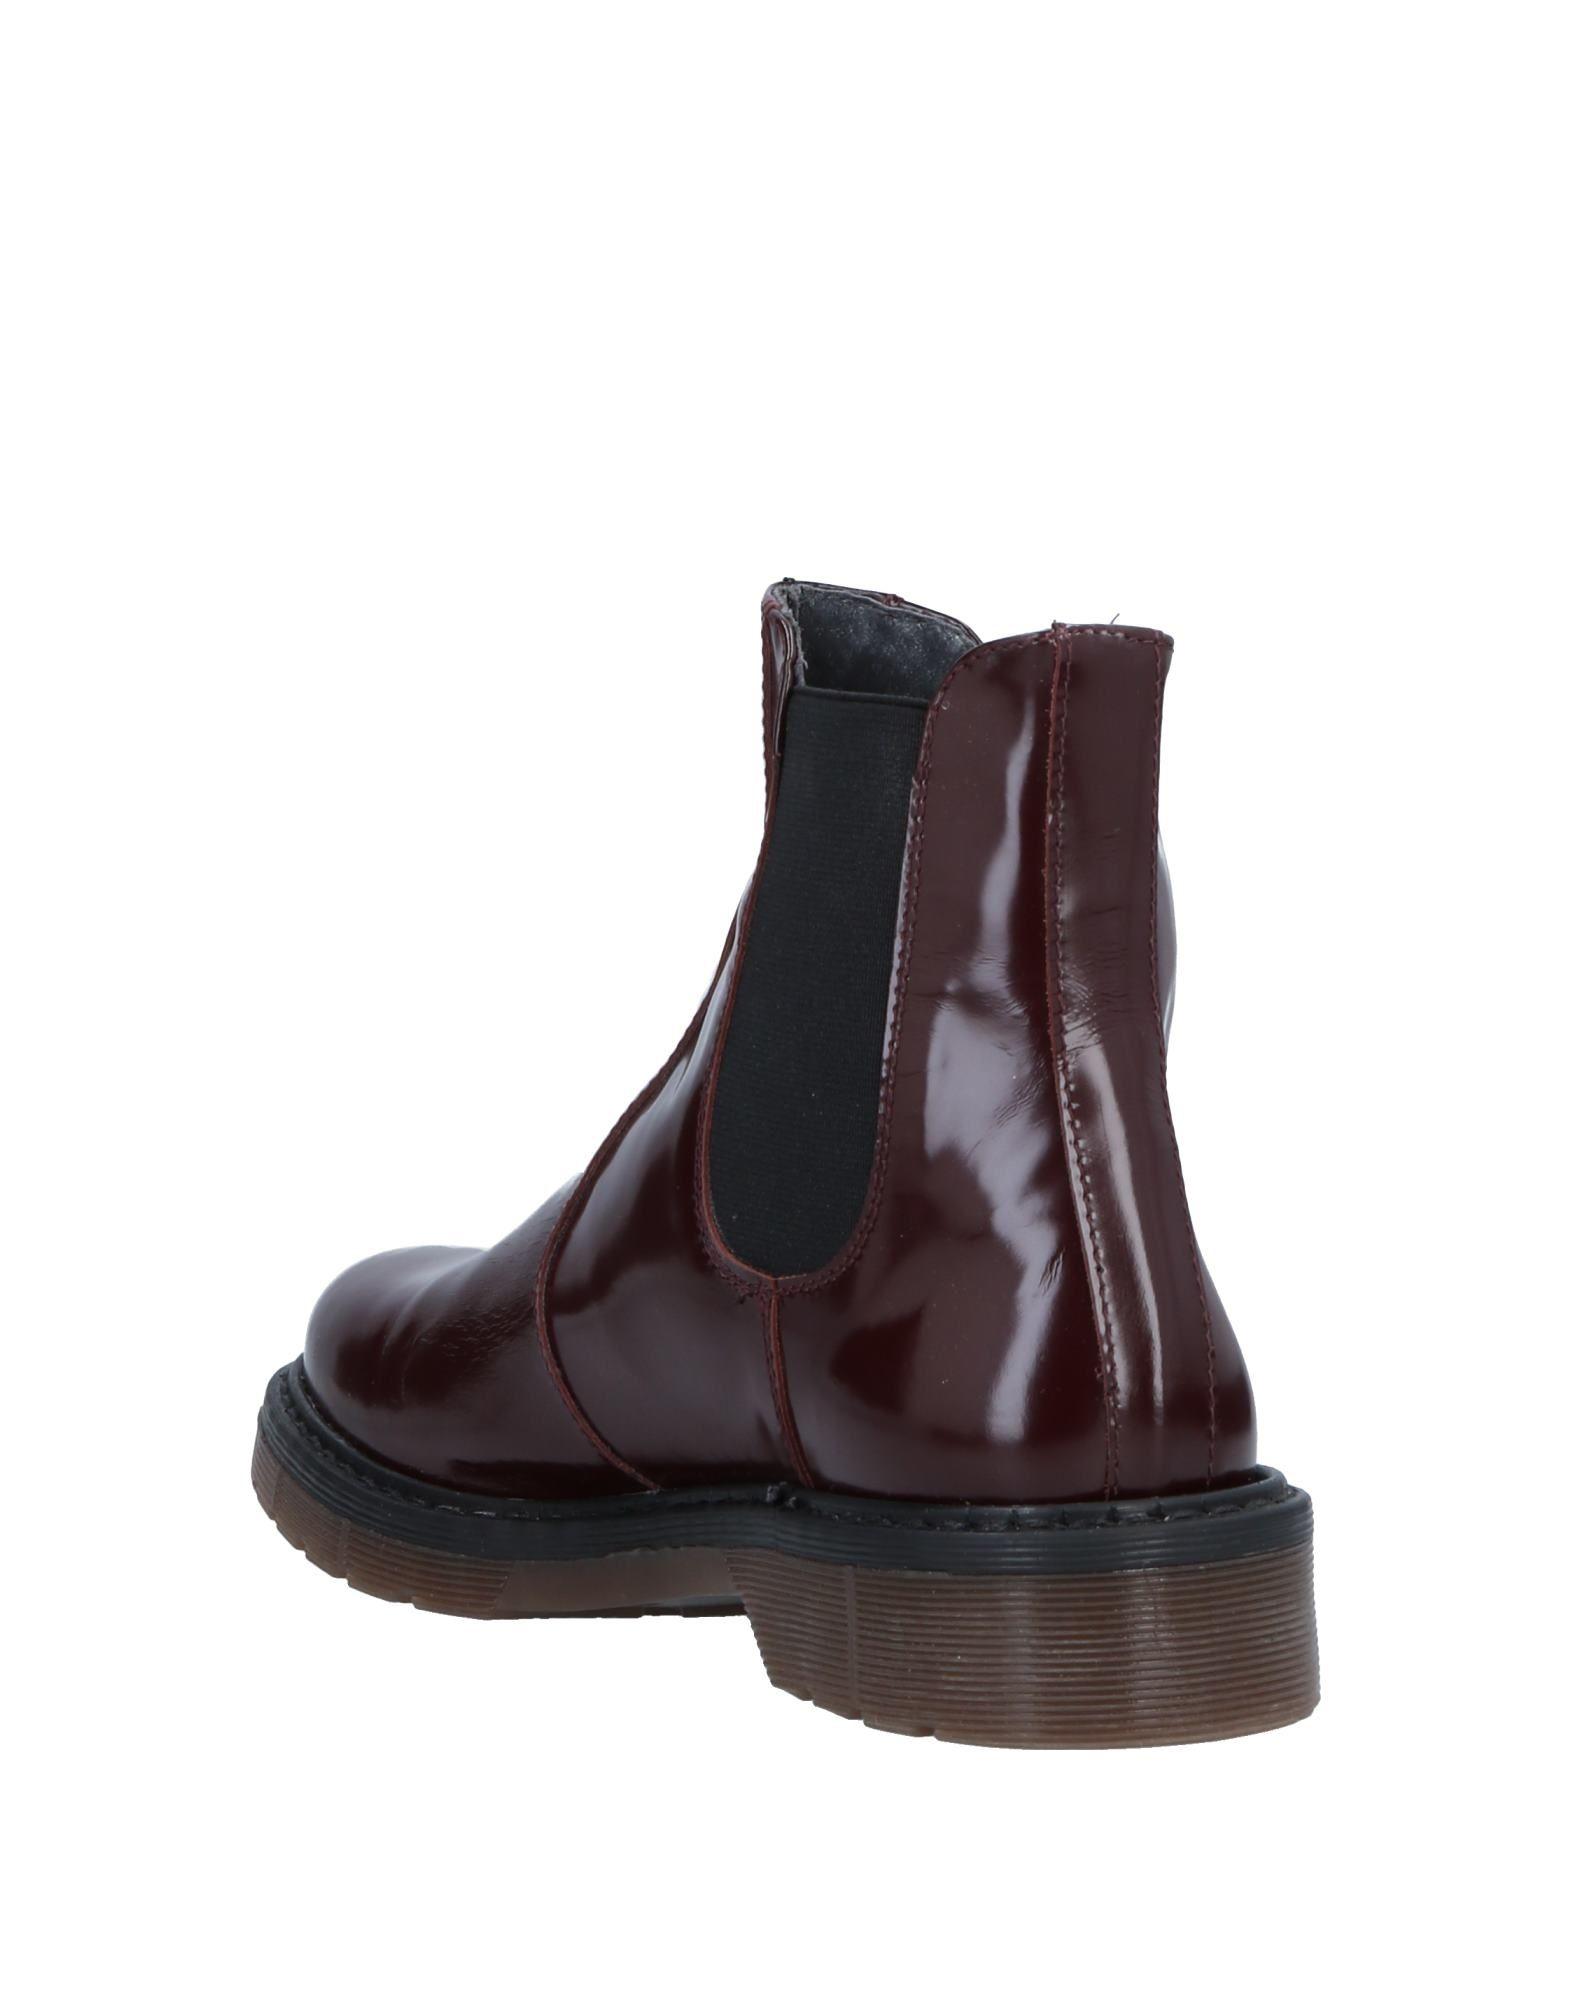 Tsd12 Chelsea 11537410DK Stiefel Damen  11537410DK Chelsea Gute Qualität beliebte Schuhe b0aab1